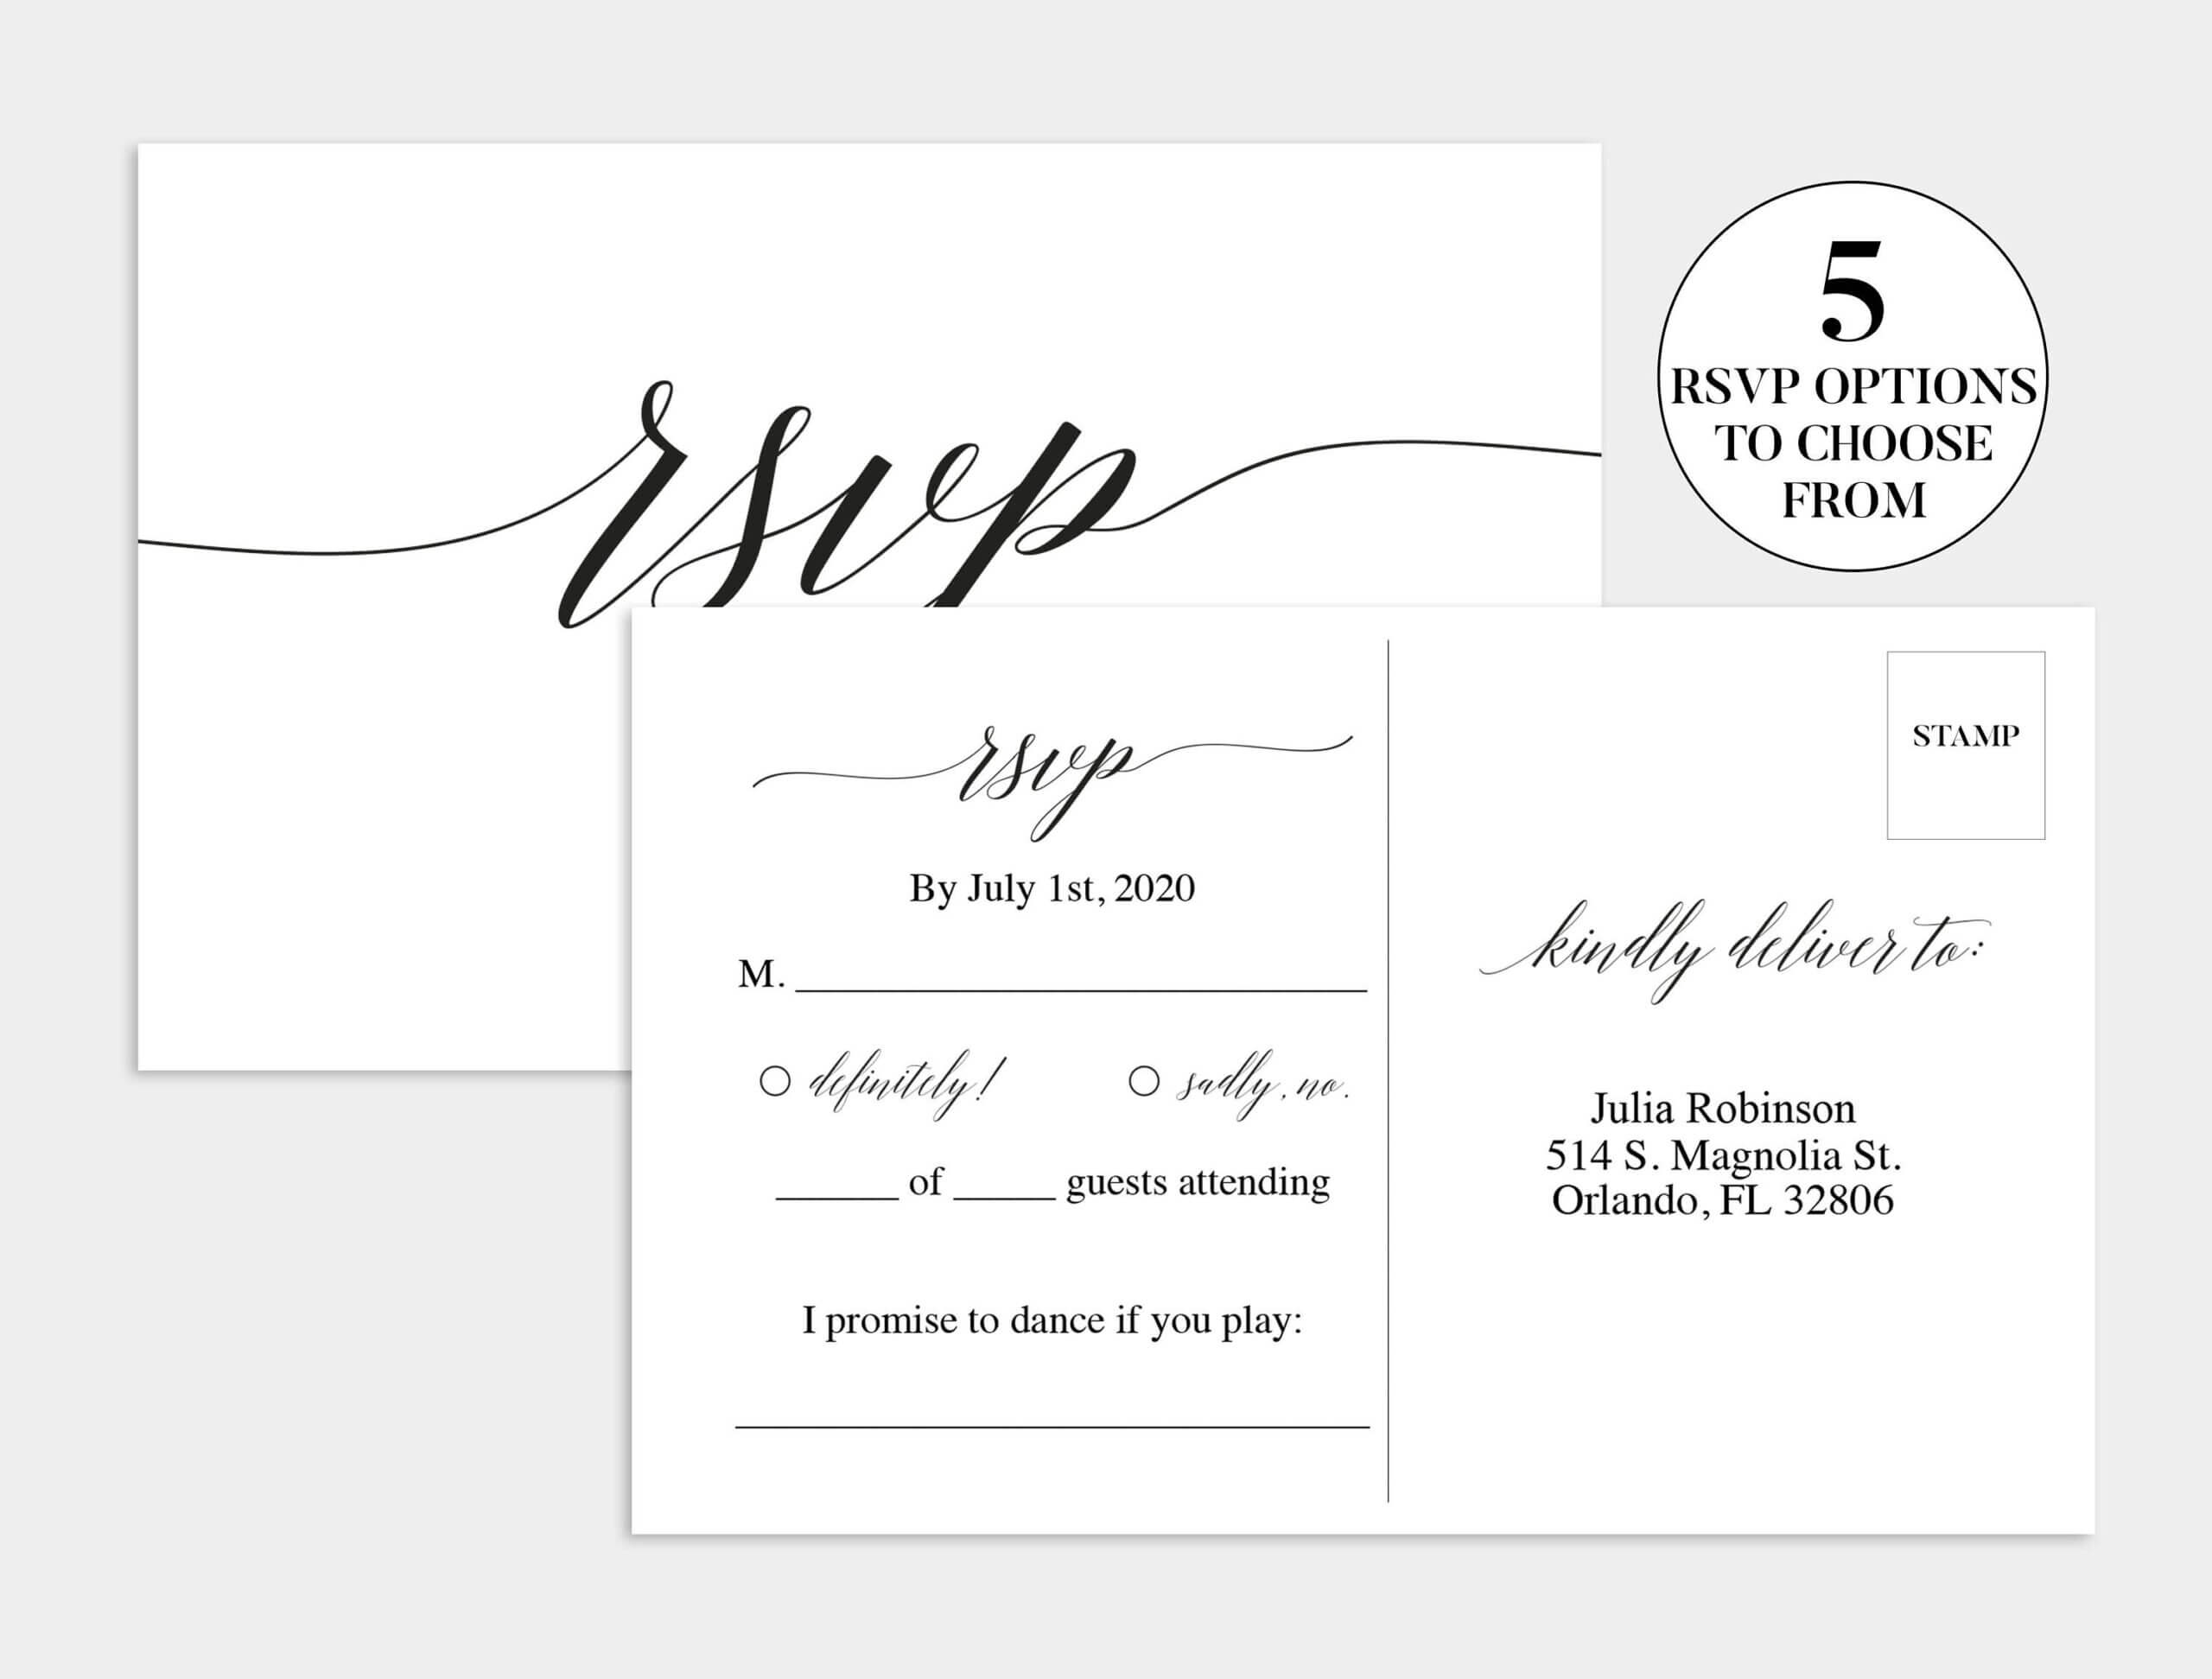 Wedding Rsvp Card   Wedding Rsvp Template   Wedding Rsvp Within Template For Rsvp Cards For Wedding